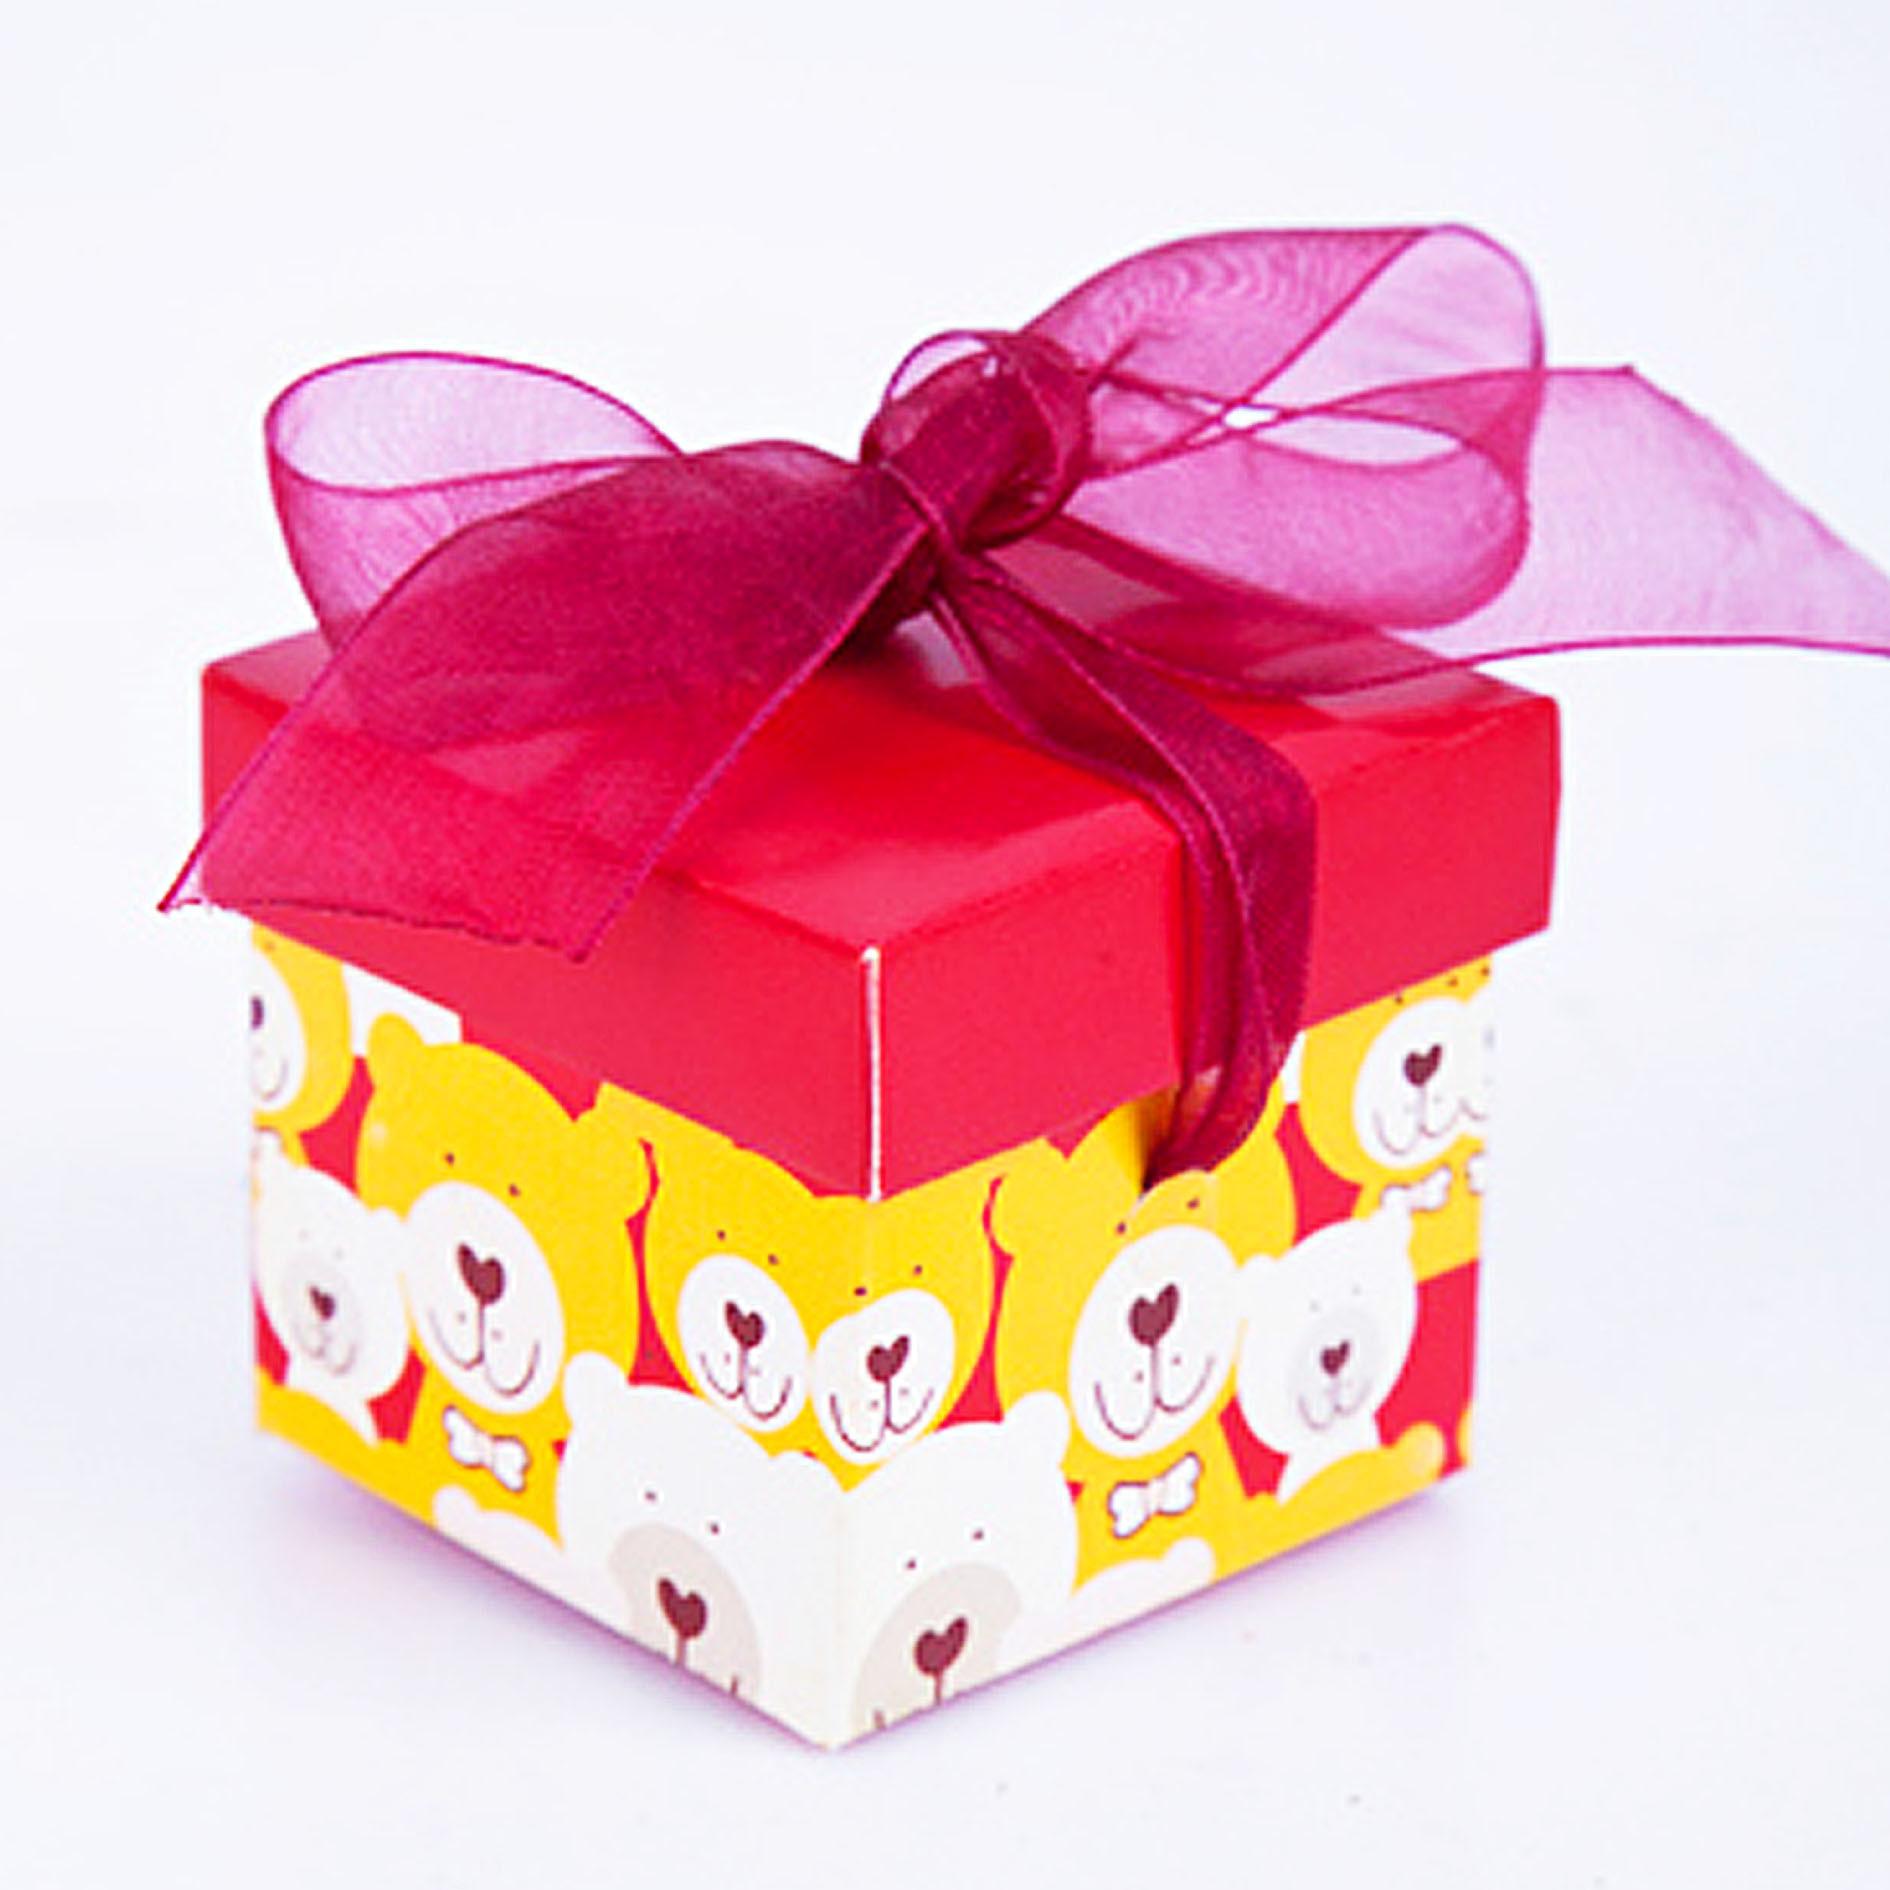 Фото коробок с подарками